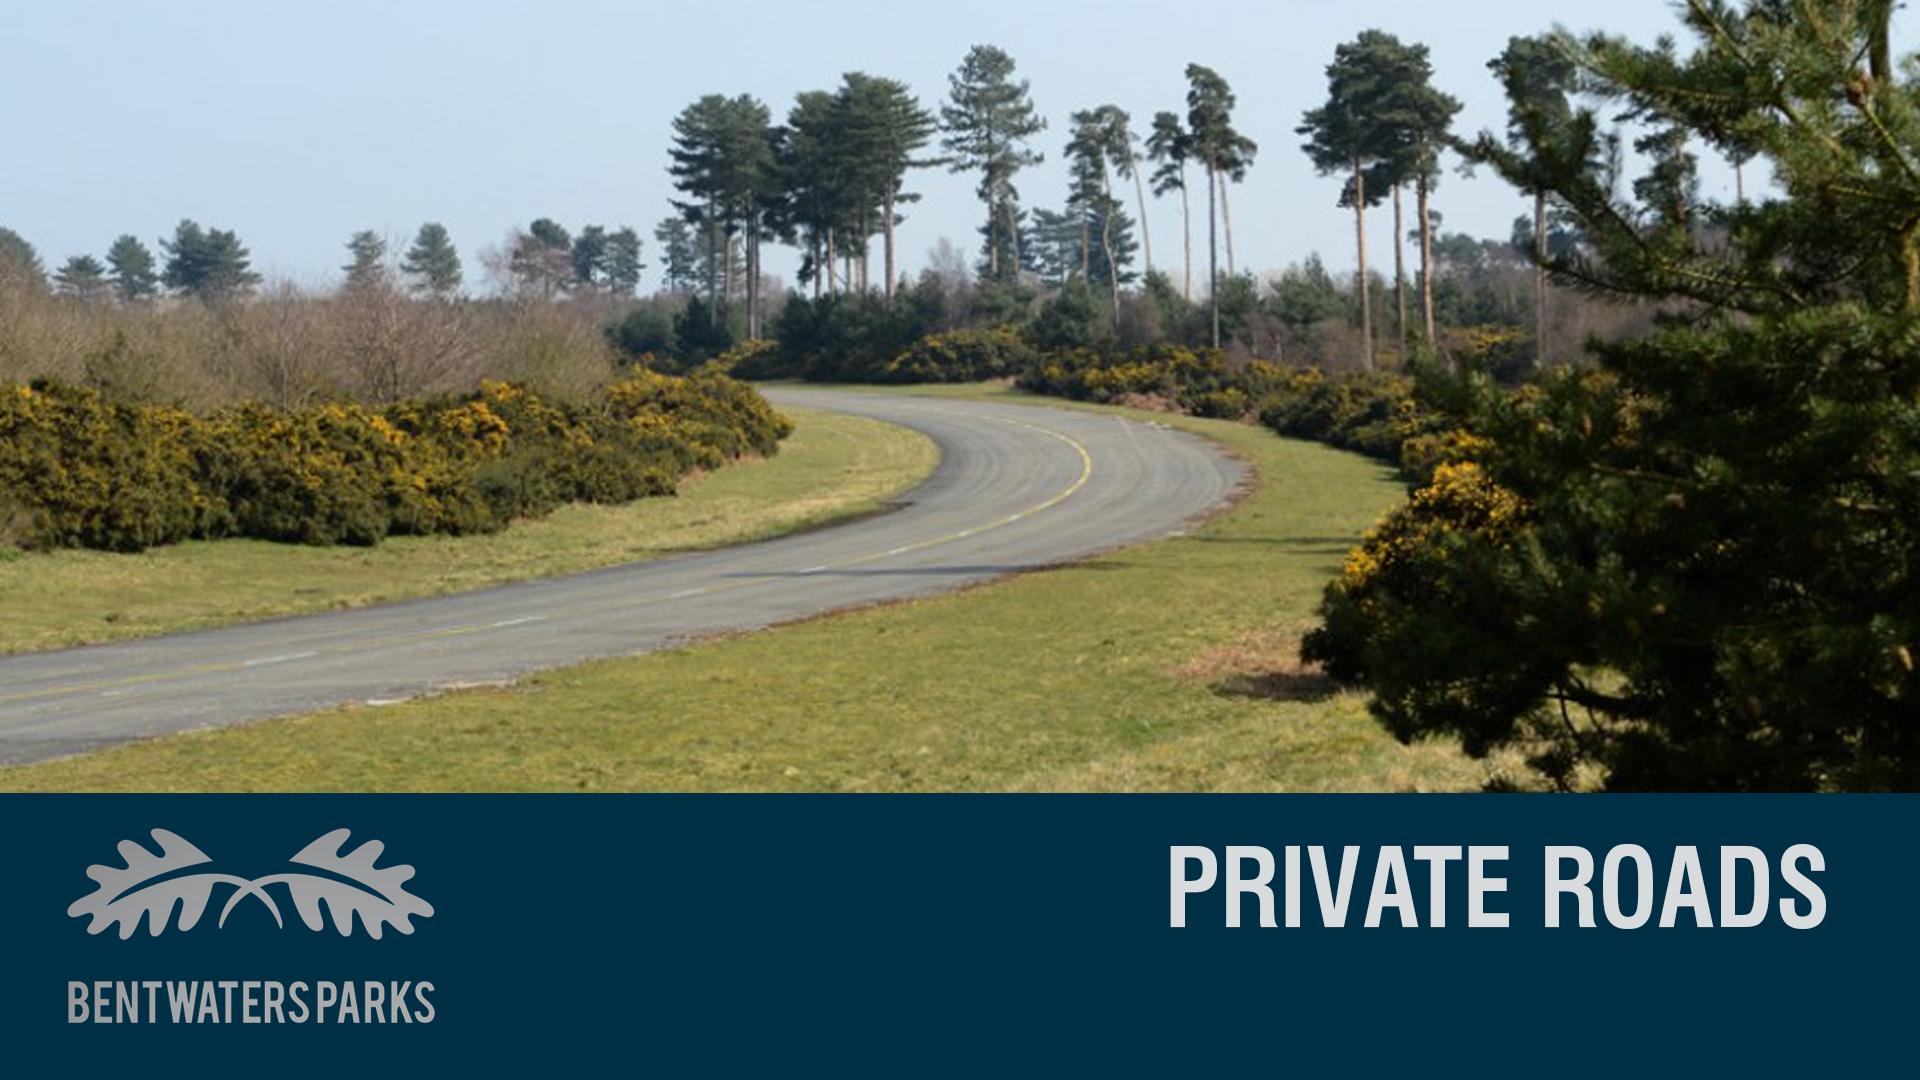 PRIVATE ROADS